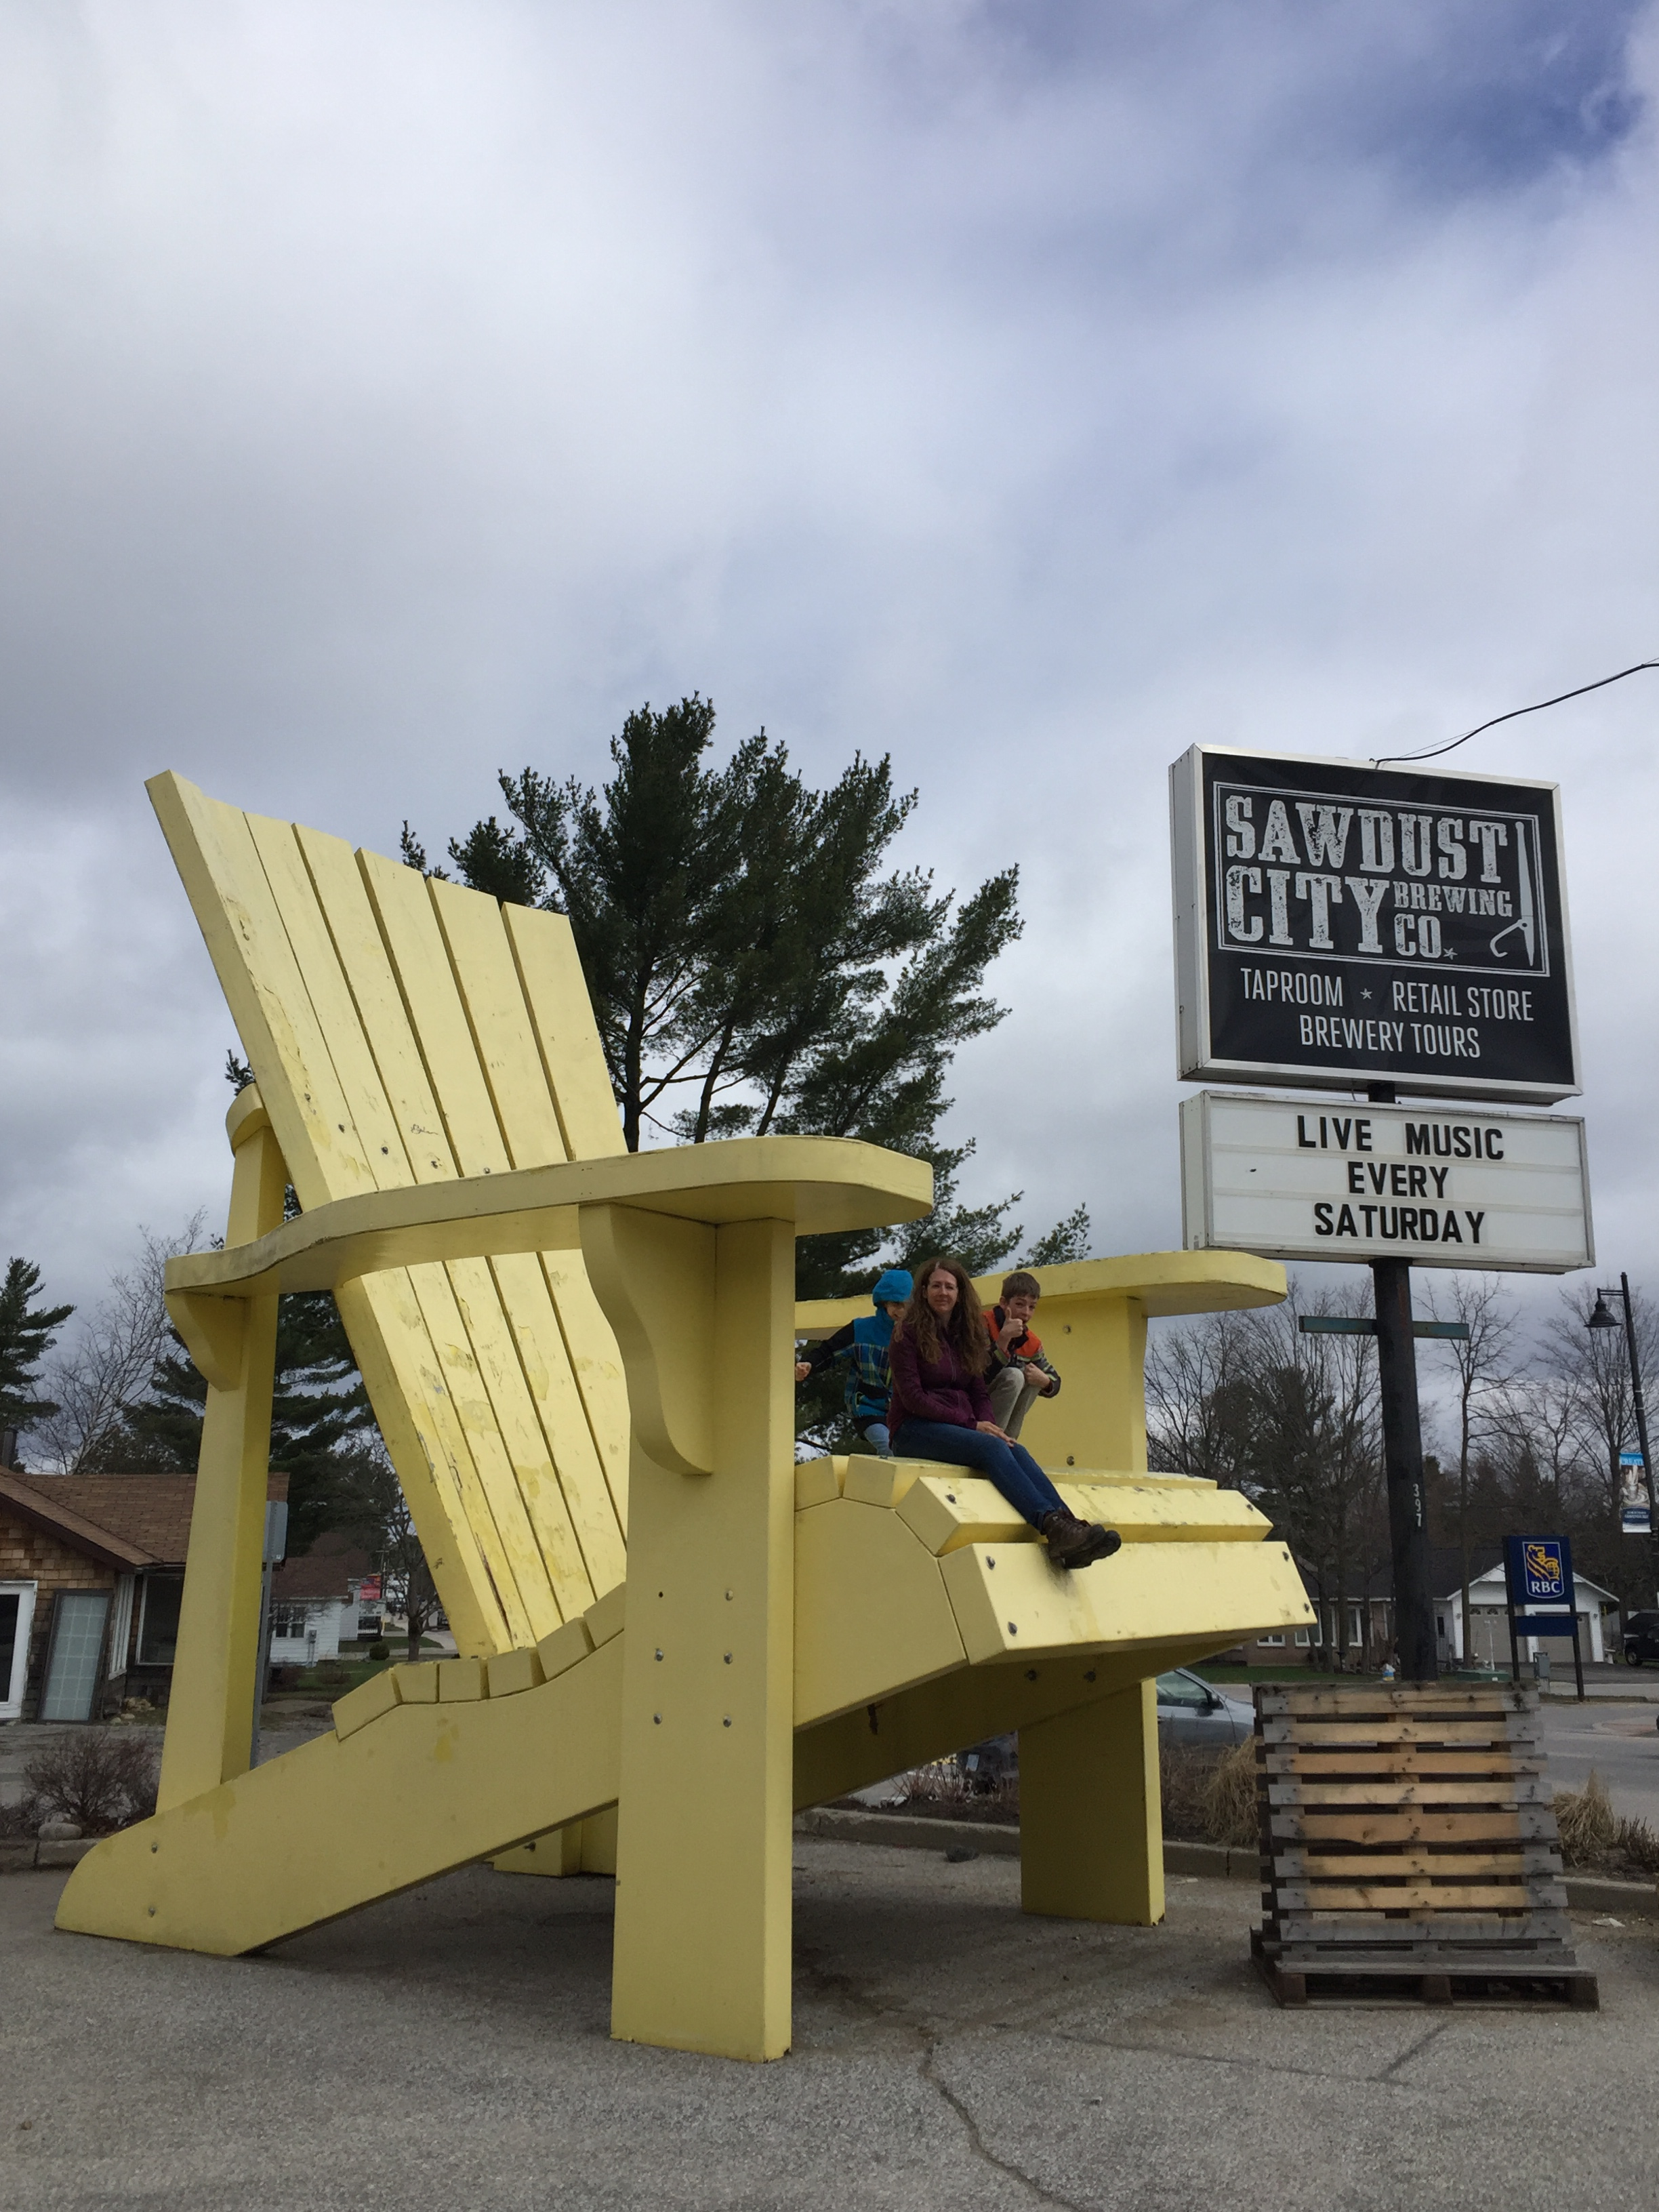 world s largest muskoka chair